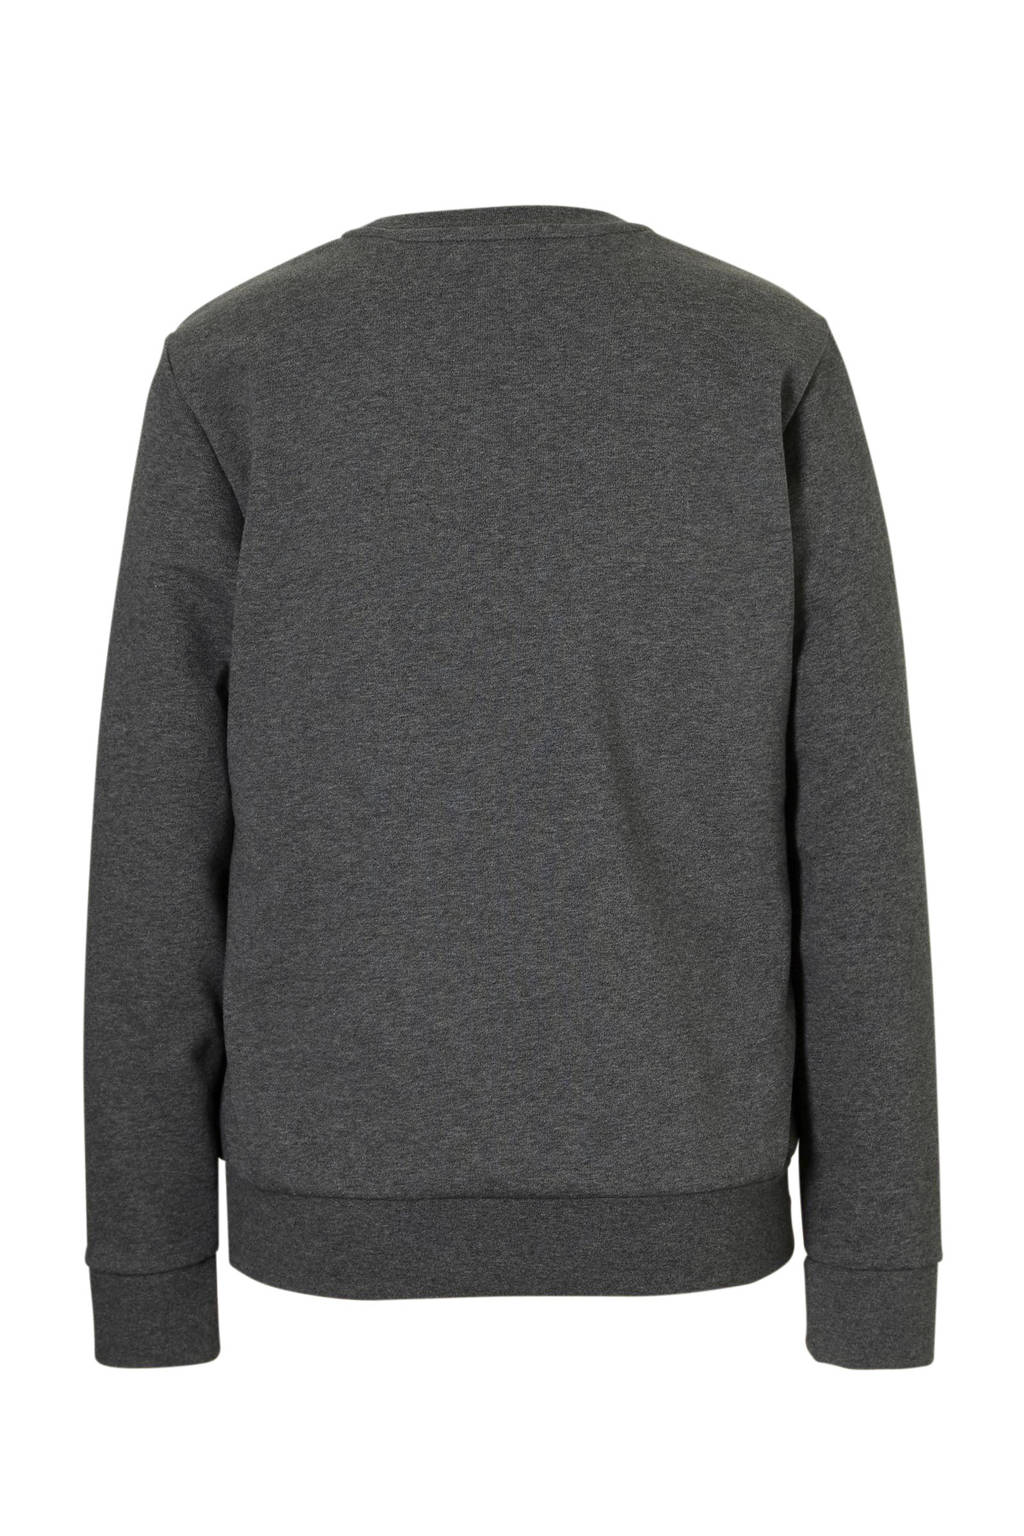 Adidasperformance Adidasperformance Sportsweater Grijs Sportsweater HTFfqfWB